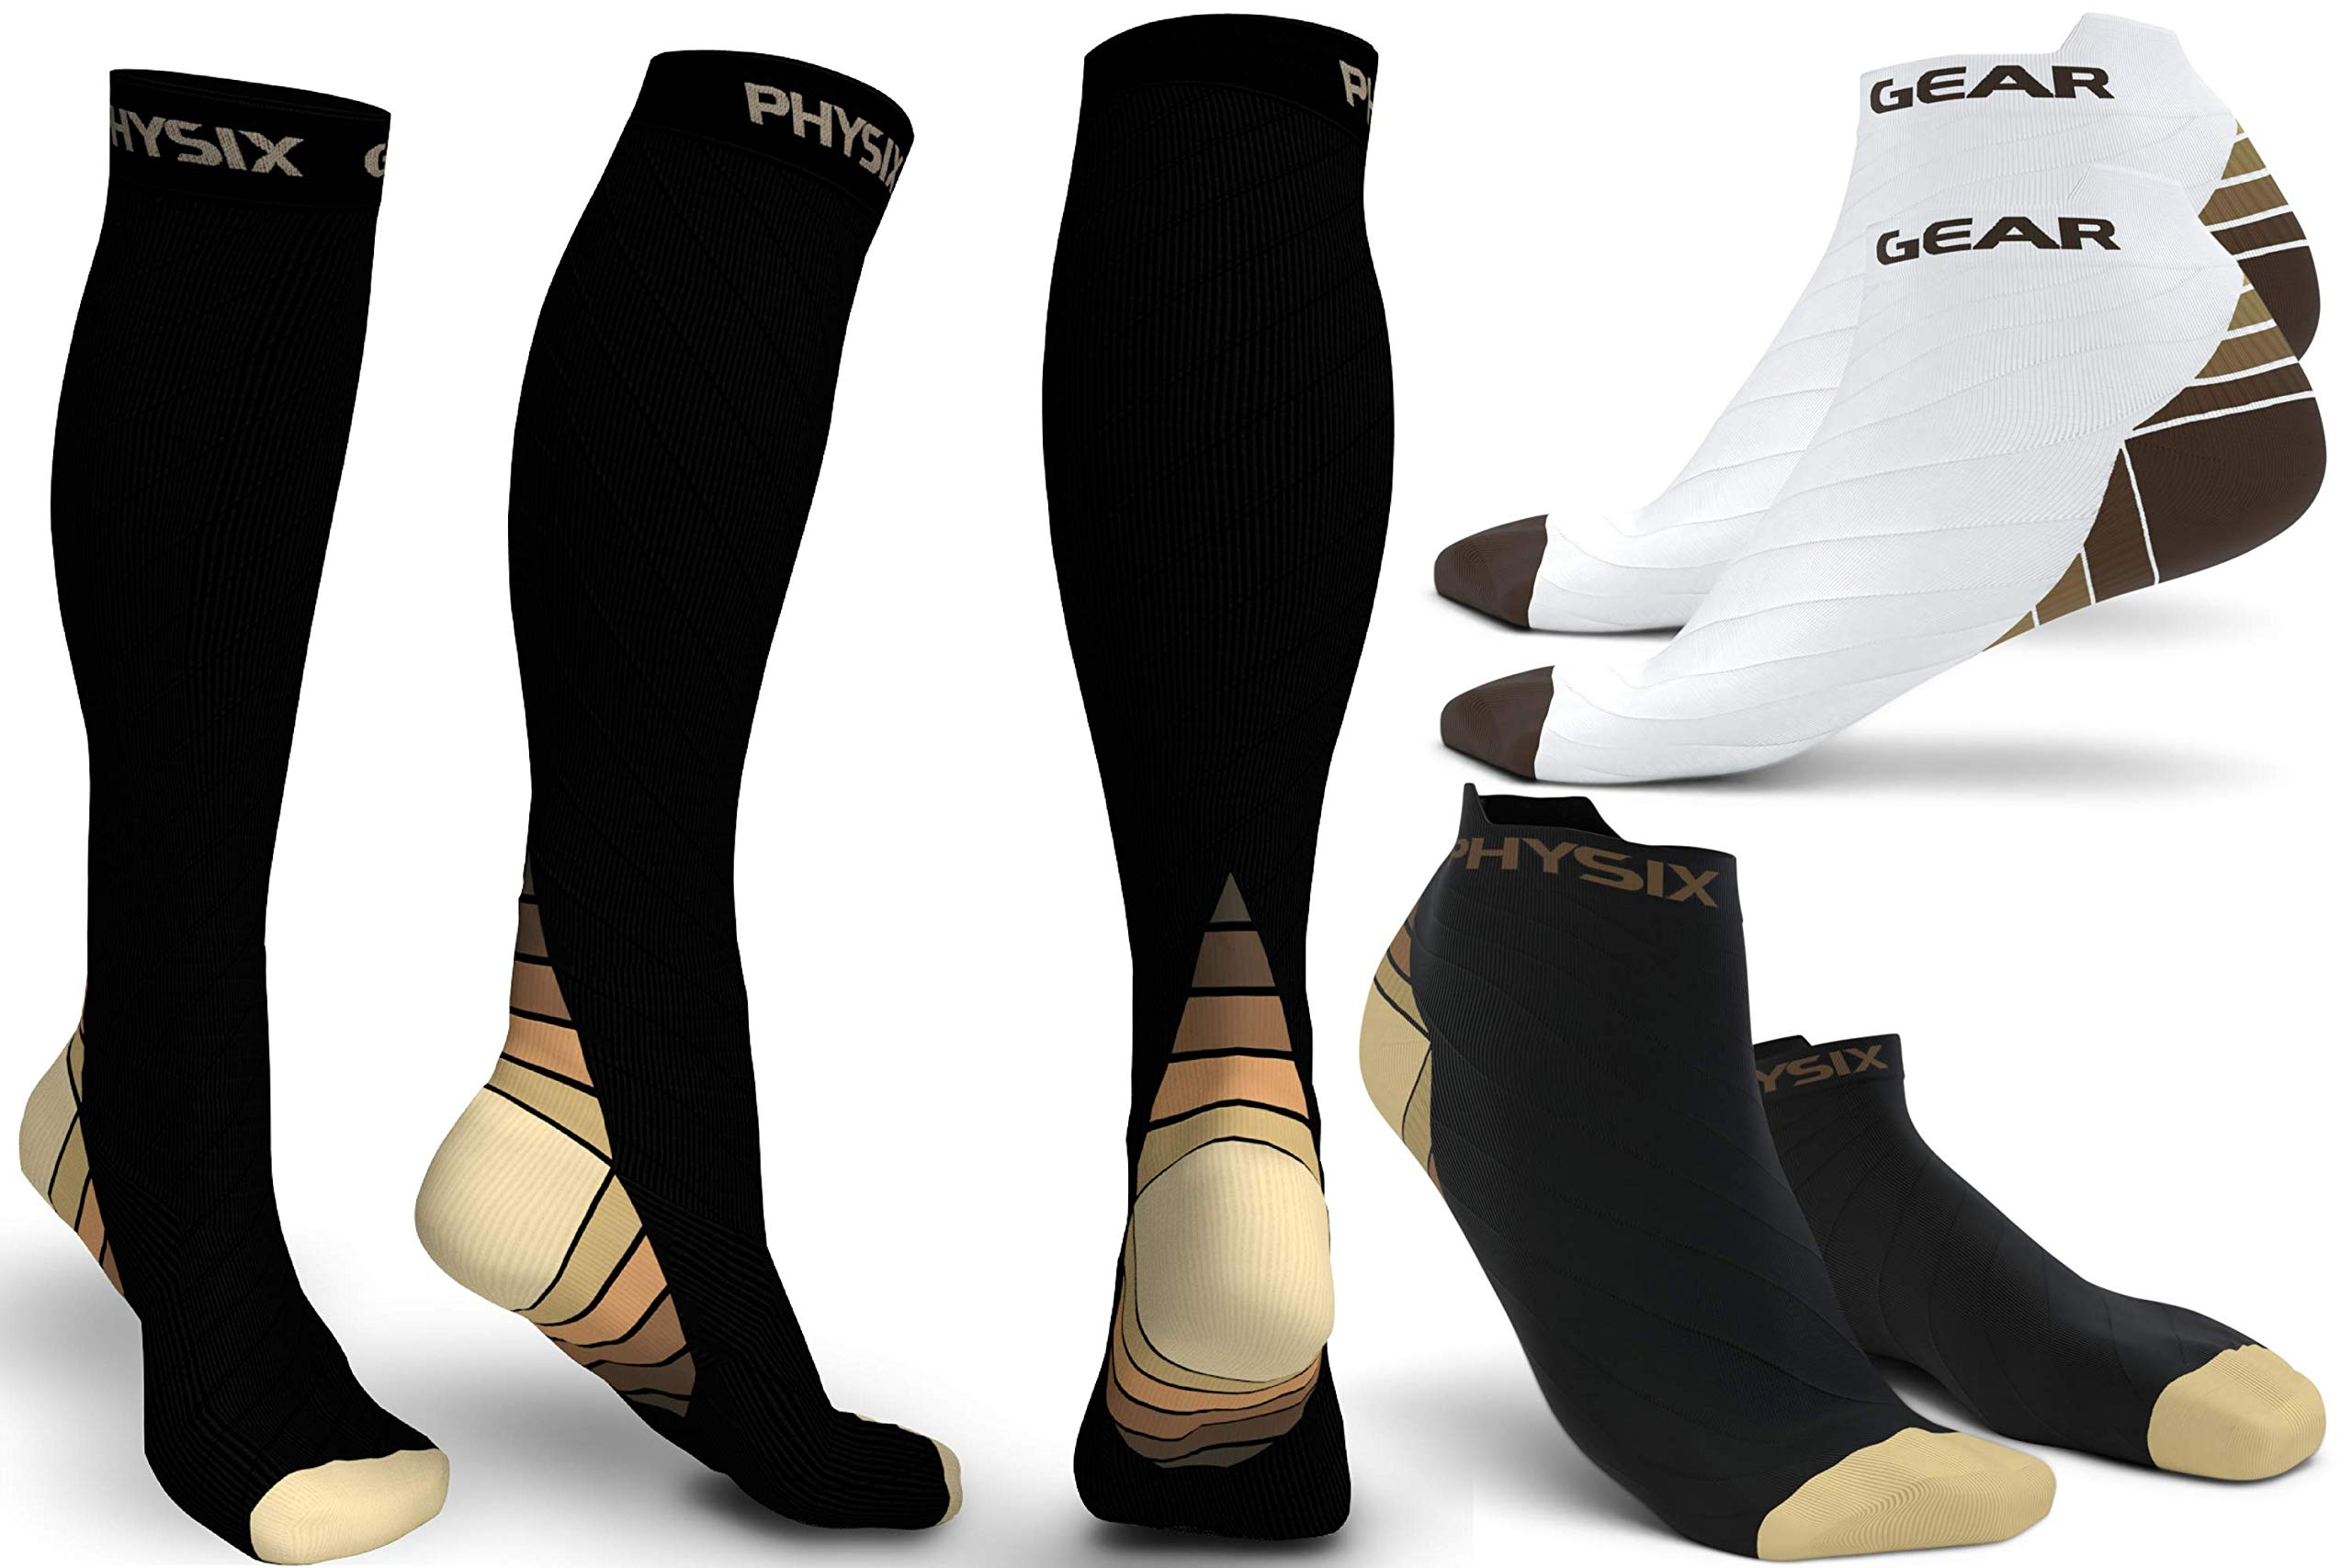 3 Pack Compression Socks for Men & Women 20-30 mmhg, Best Graduated Athletic Fit for Running Nurses Shin Splints Flight Travel & Maternity Pregnancy - Boost Stamina Circulation & Recovery BGE LXL